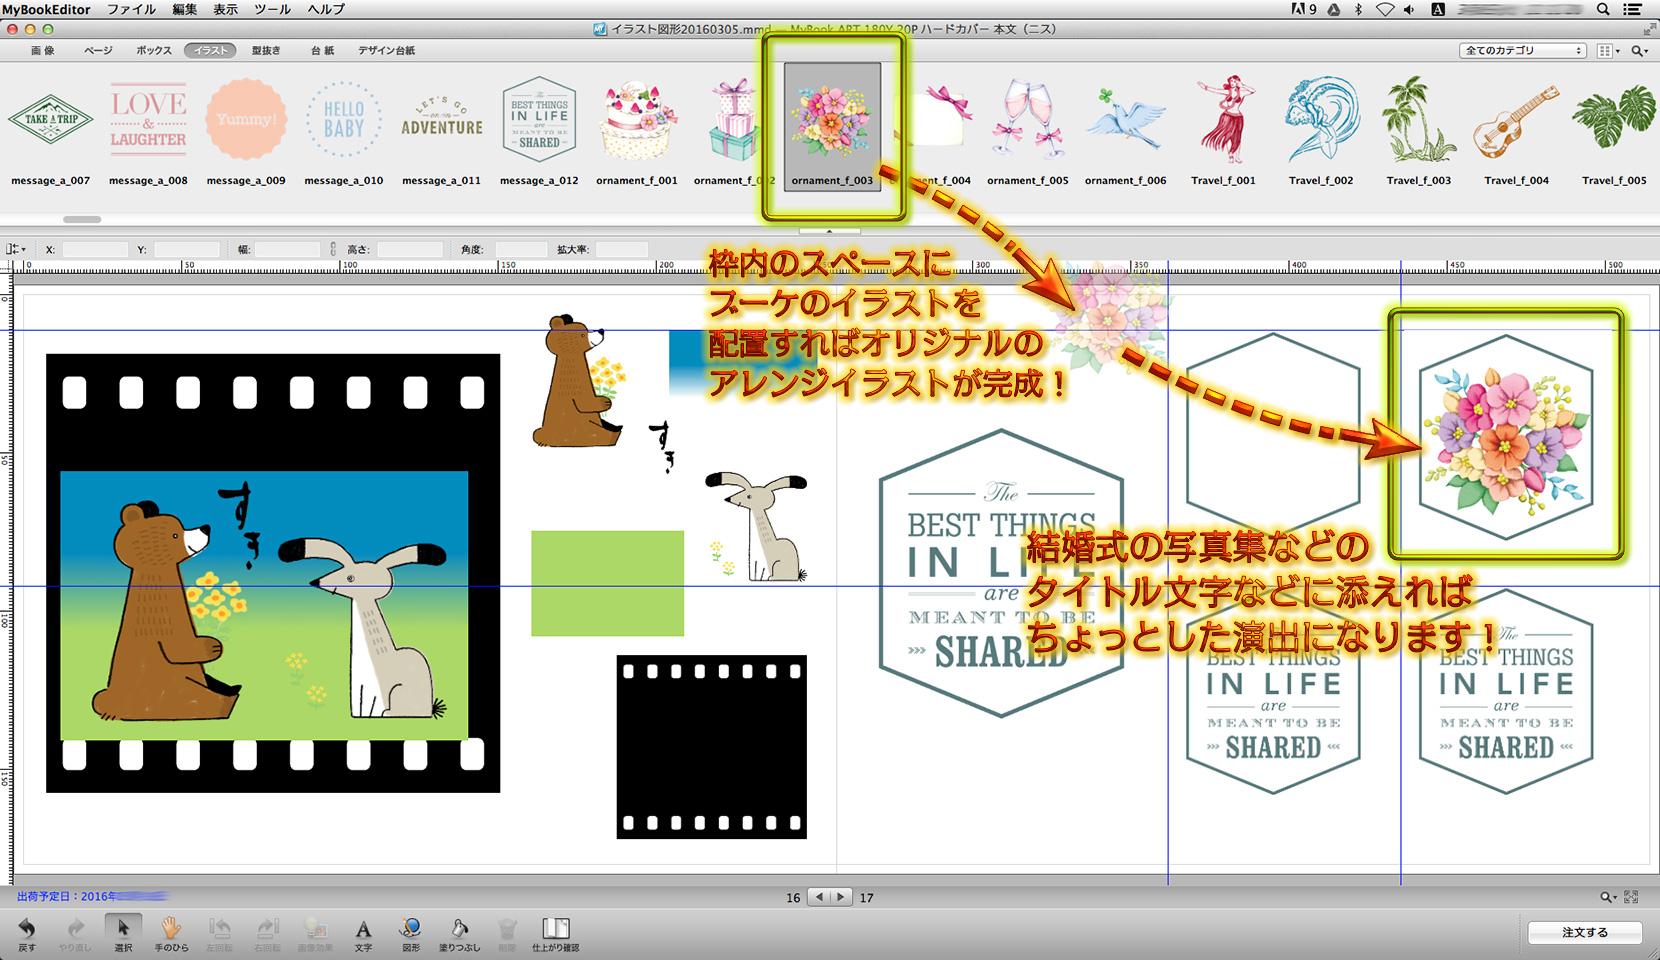 http://moritetsu.info/car/img/mb151-2016-03-08-11-11-20.jpg